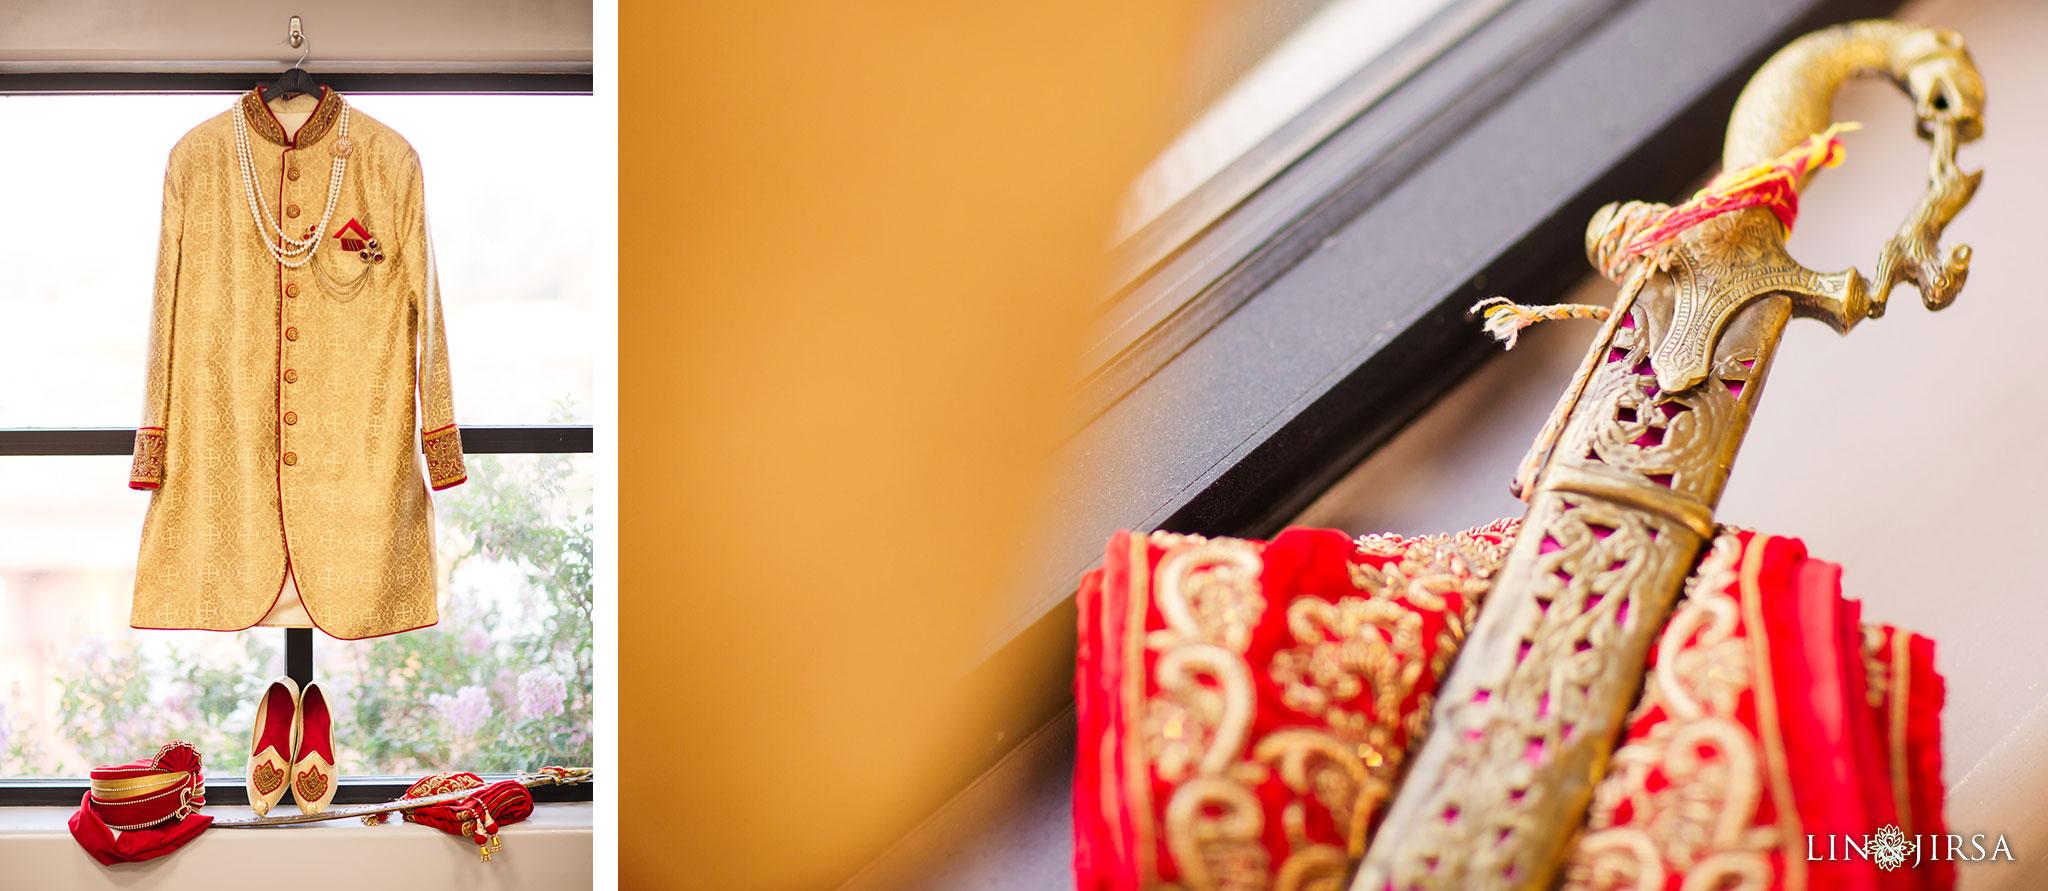 068 BAPS Swaminarayan Sanstha Chino Hills Indian Wedding Photography